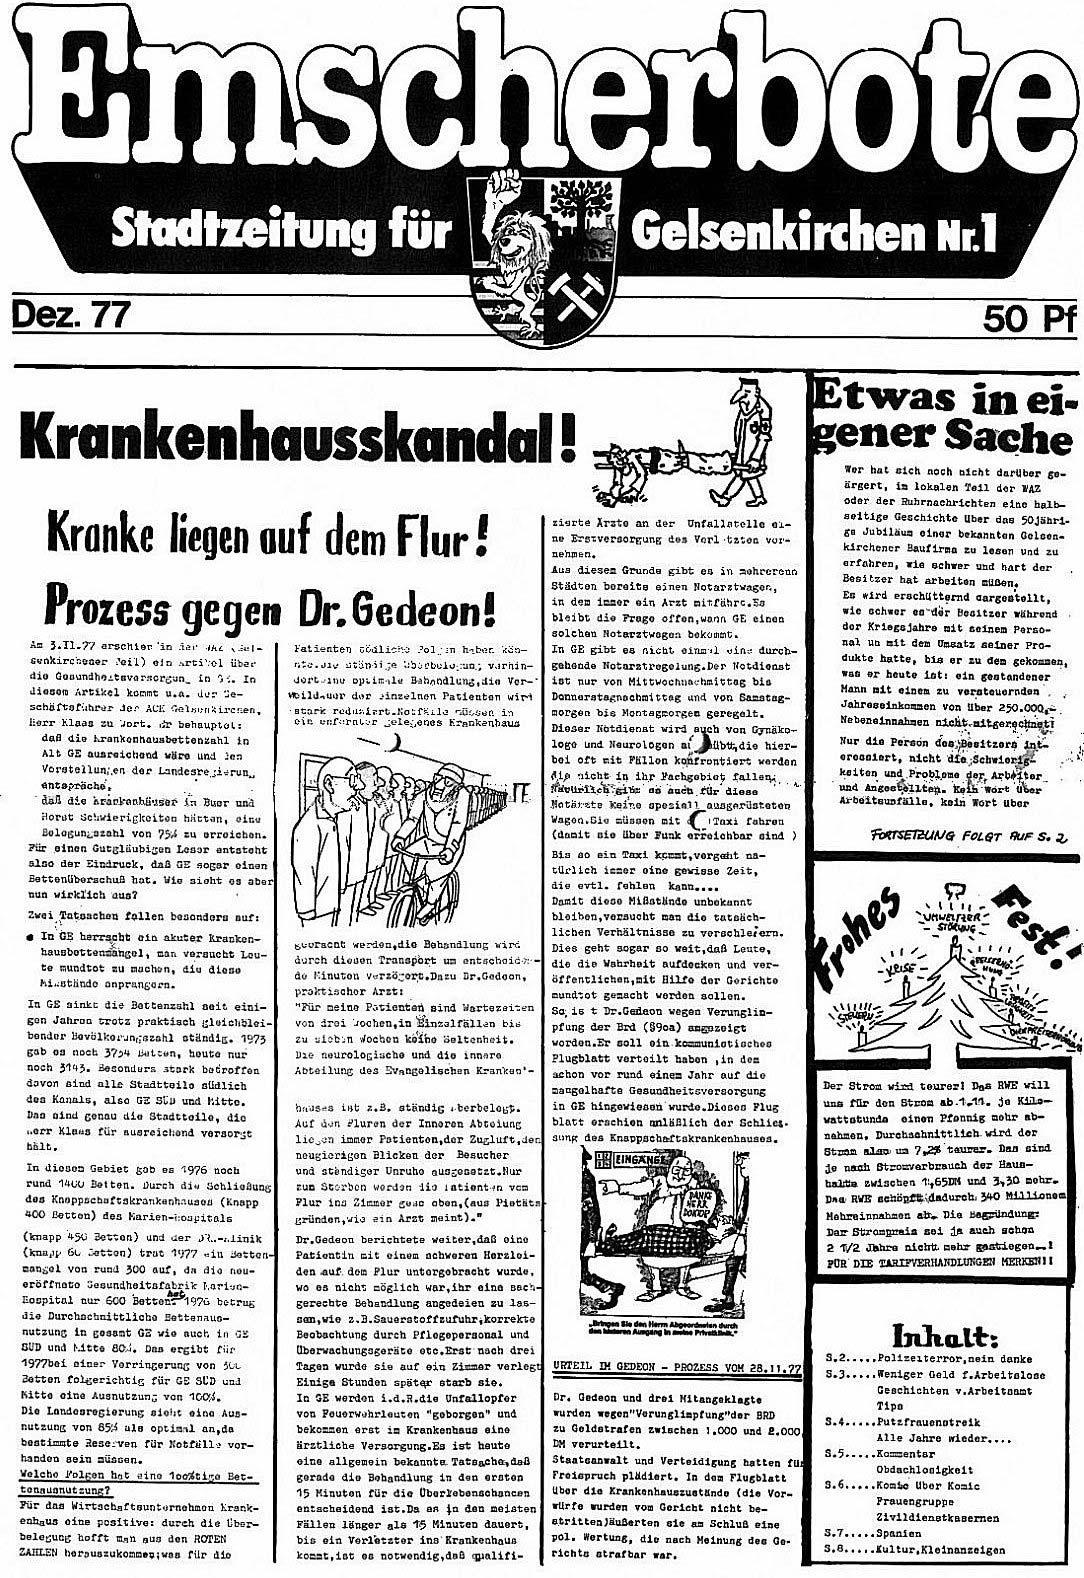 Gelsenkirchen_Emscherbote_1977_01_01